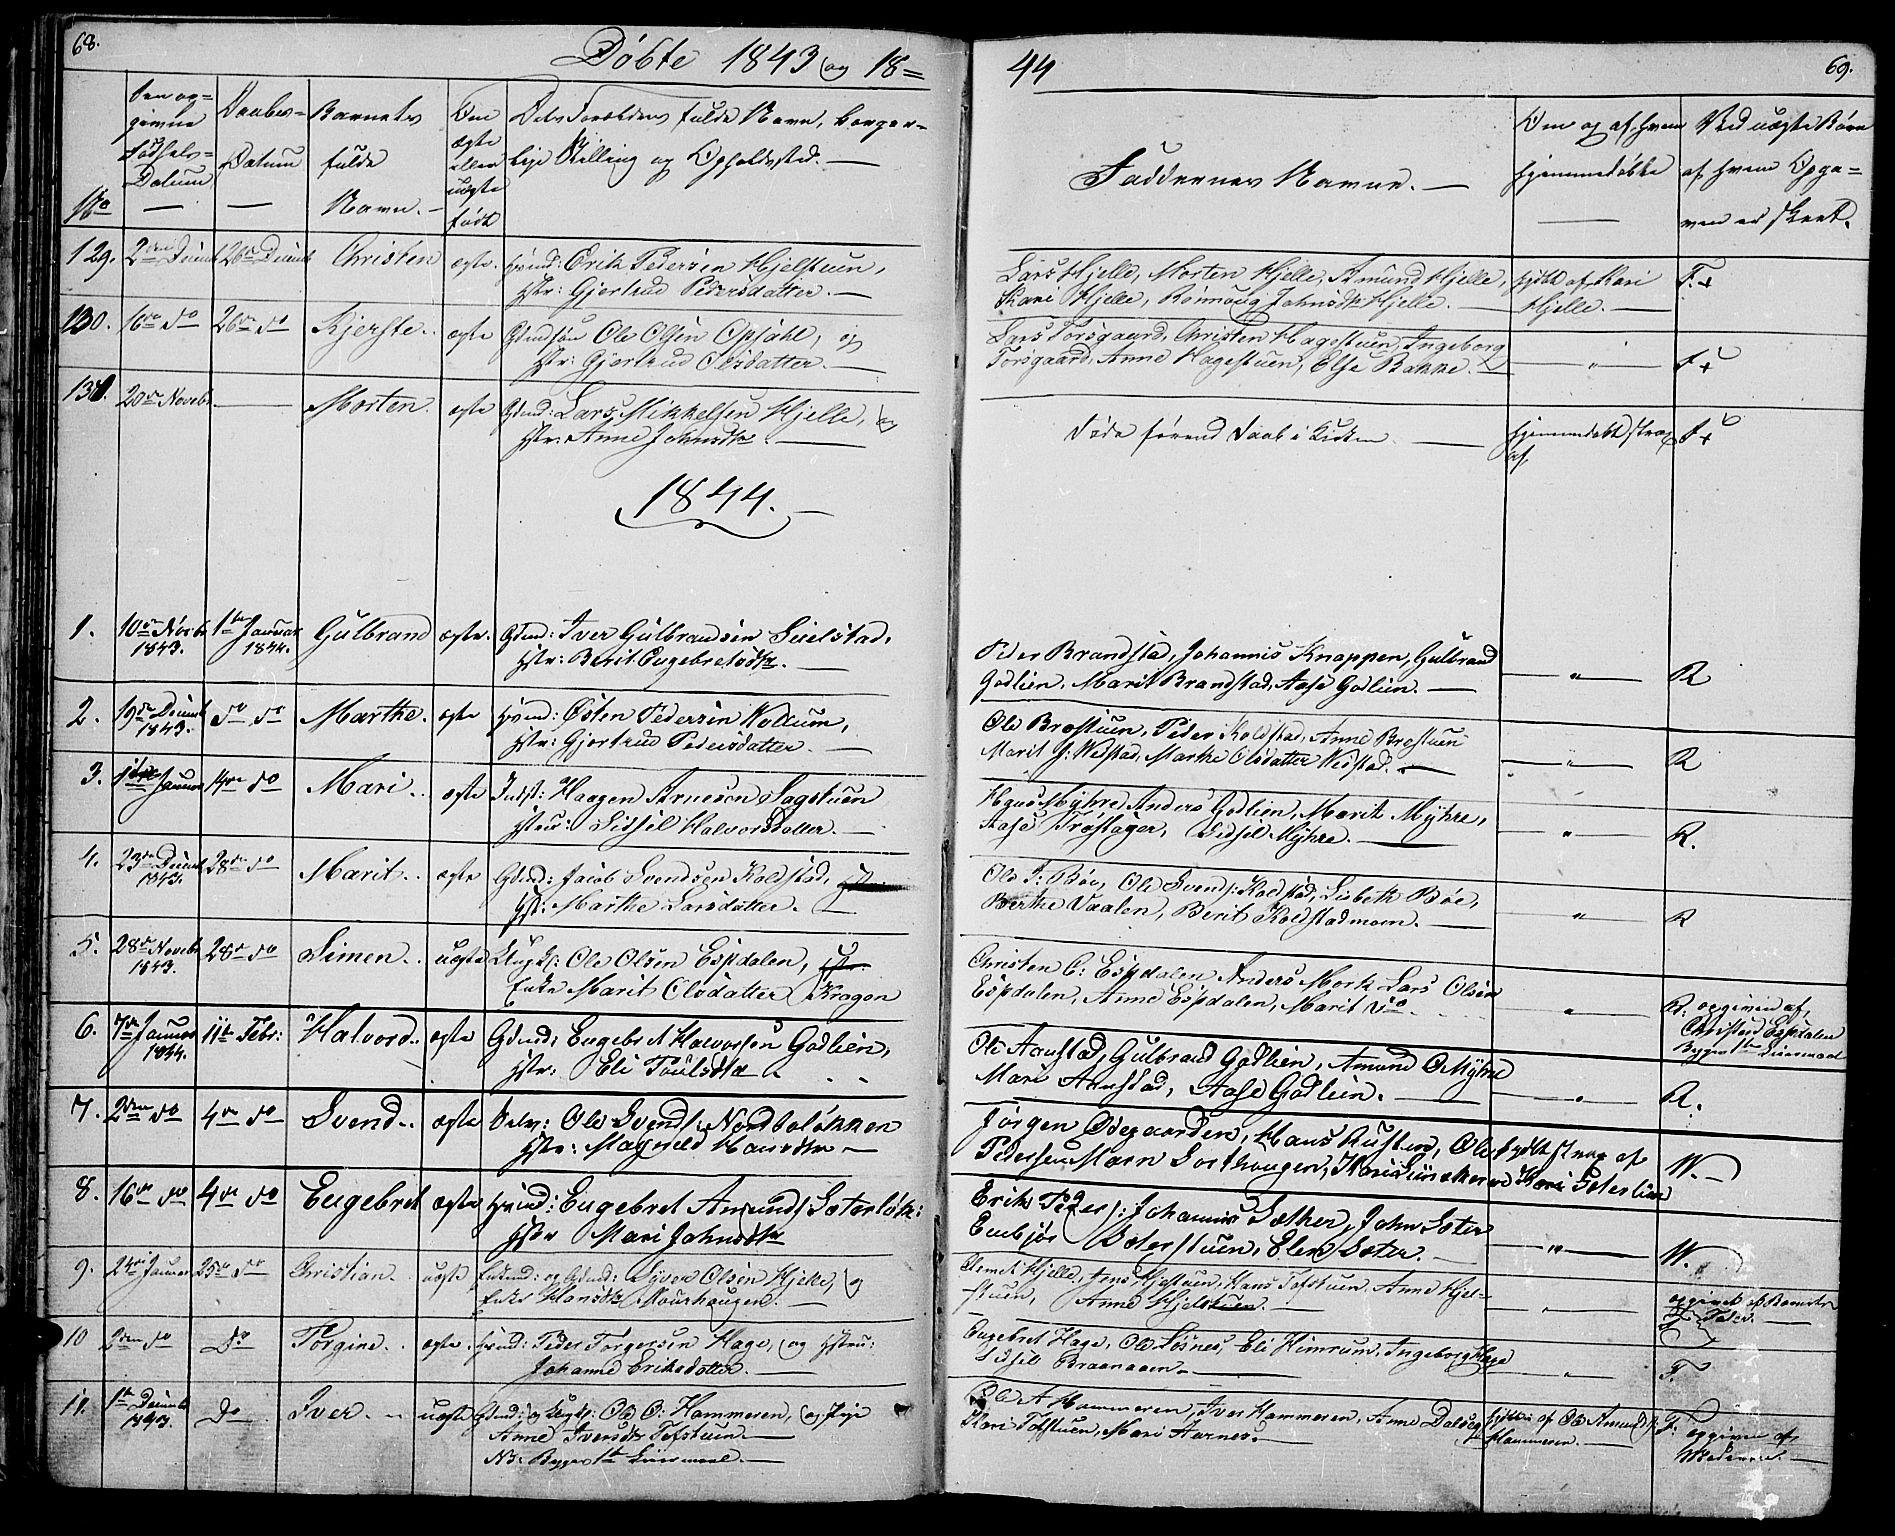 SAH, Ringebu prestekontor, Klokkerbok nr. 2, 1839-1853, s. 68-69